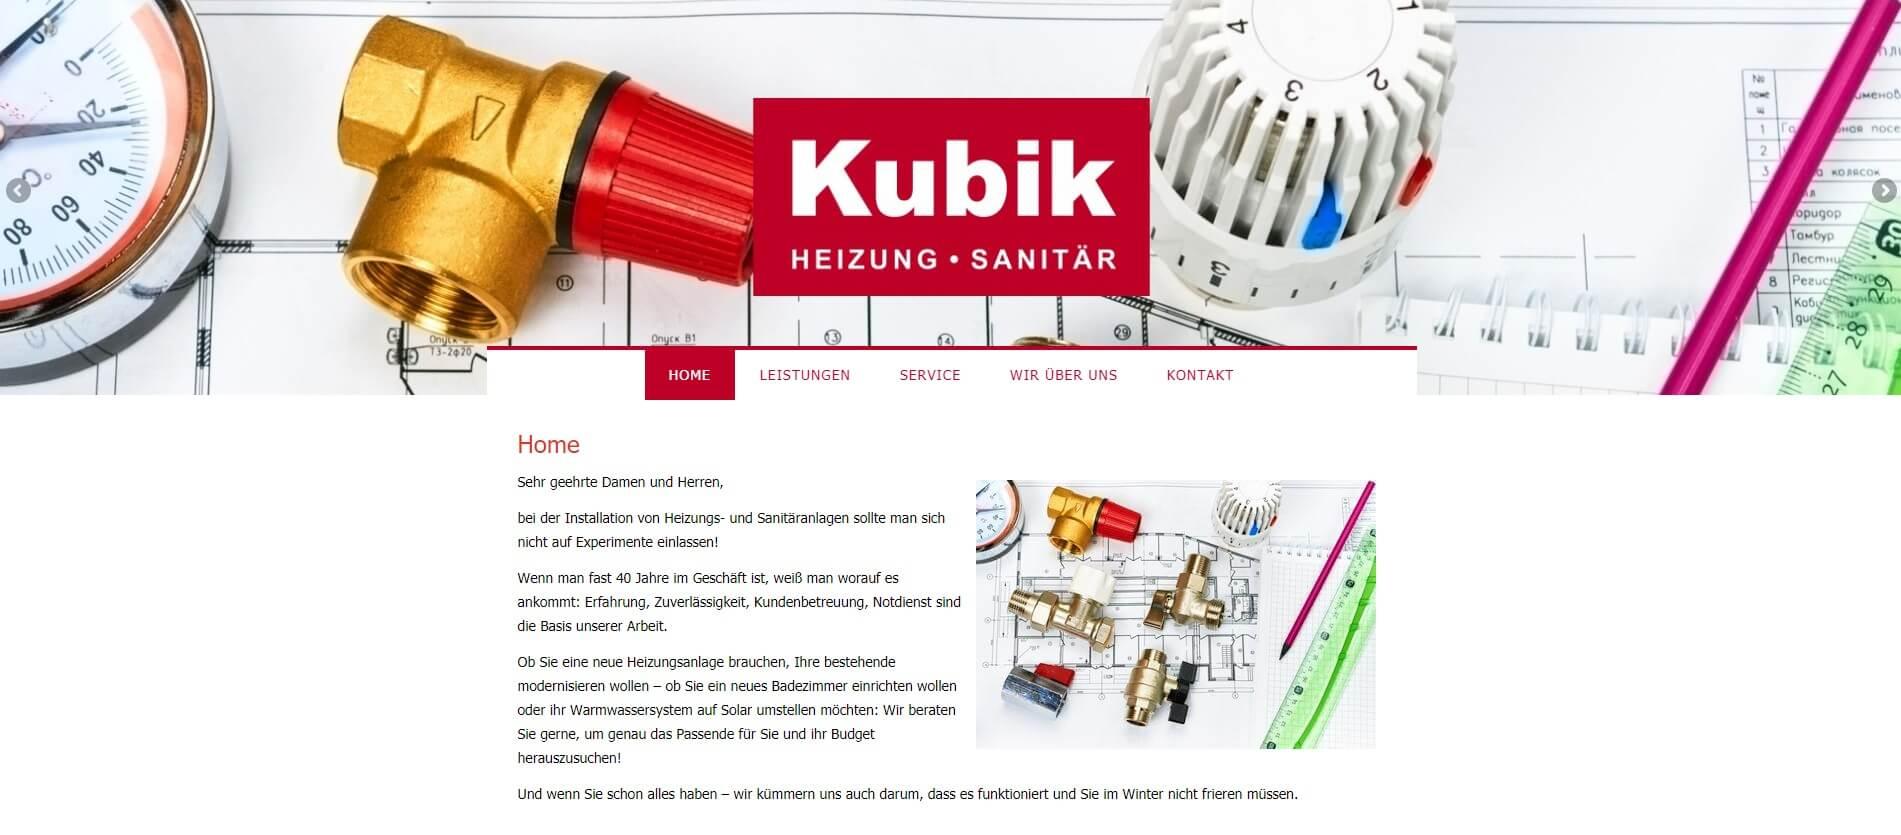 Image of Kubik Heizungs-Sanitär-GmbH in Rheinberg